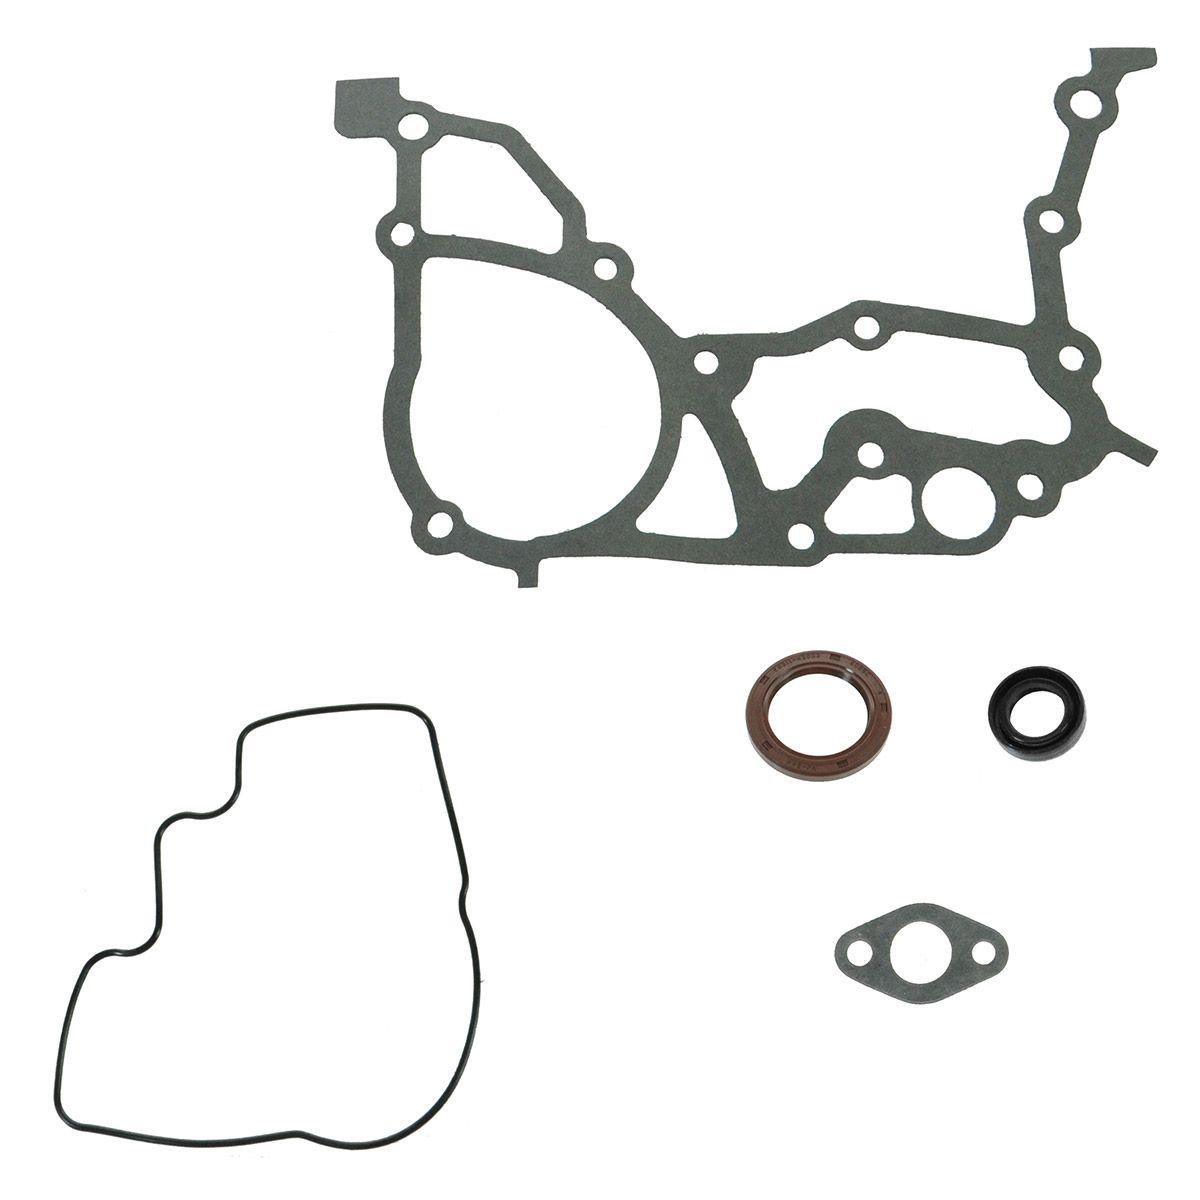 FELPRO Crankshaft Seal Kit Set for Toyota Camry Celica MR